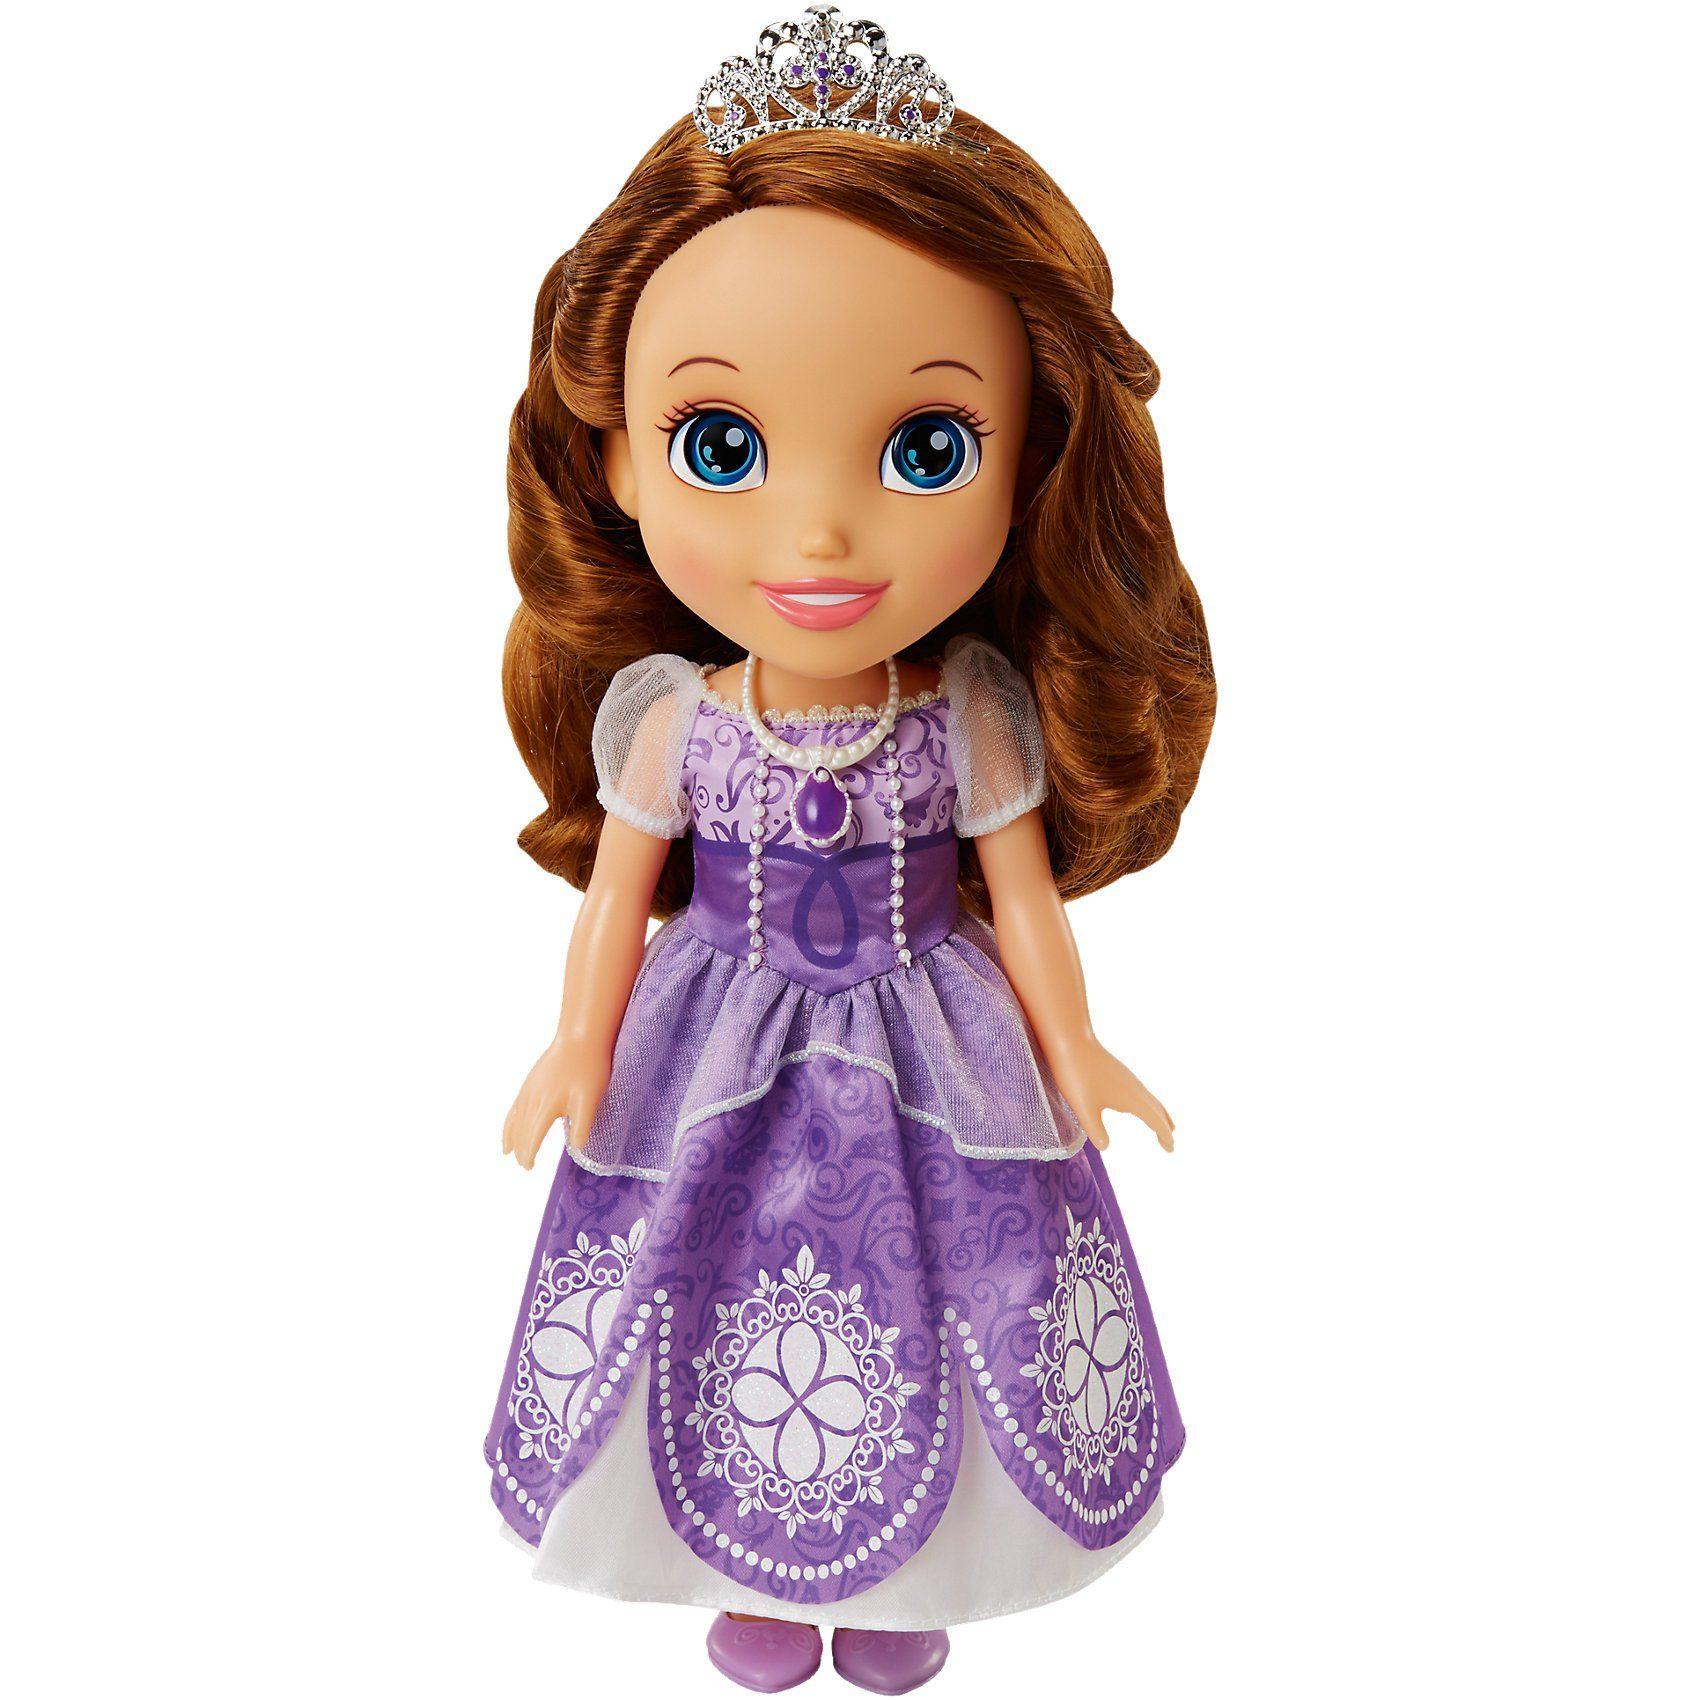 Jakks Pacific Disney Prinzessin Sofia, 35 cm